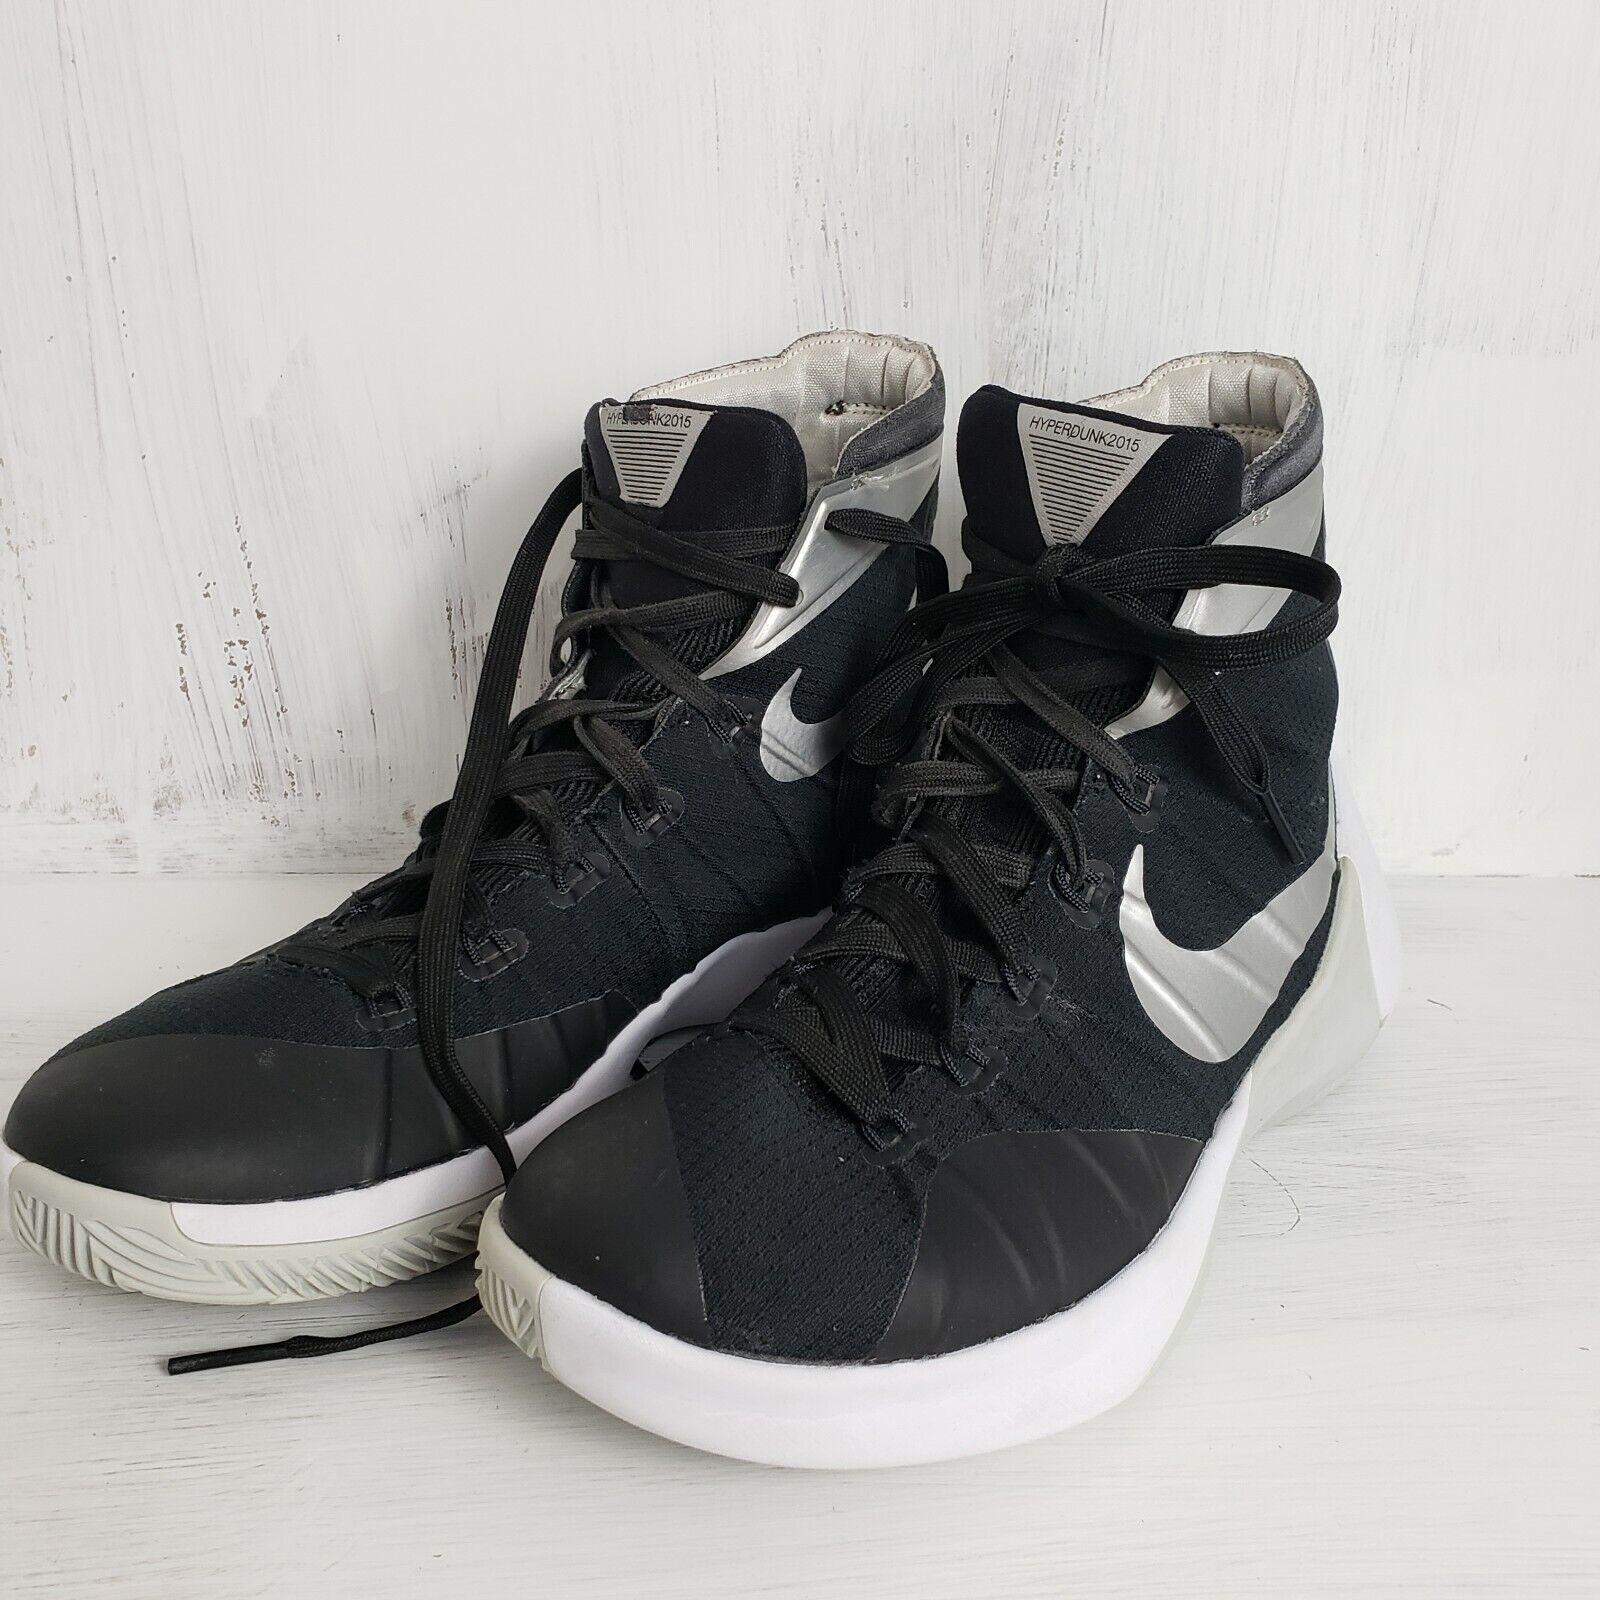 huge discount bafe8 b4b32 Nike Mens shoes Hyperdunk 2015 Hi Top Size Size Size 8.5 Black and White  Basketball shoes